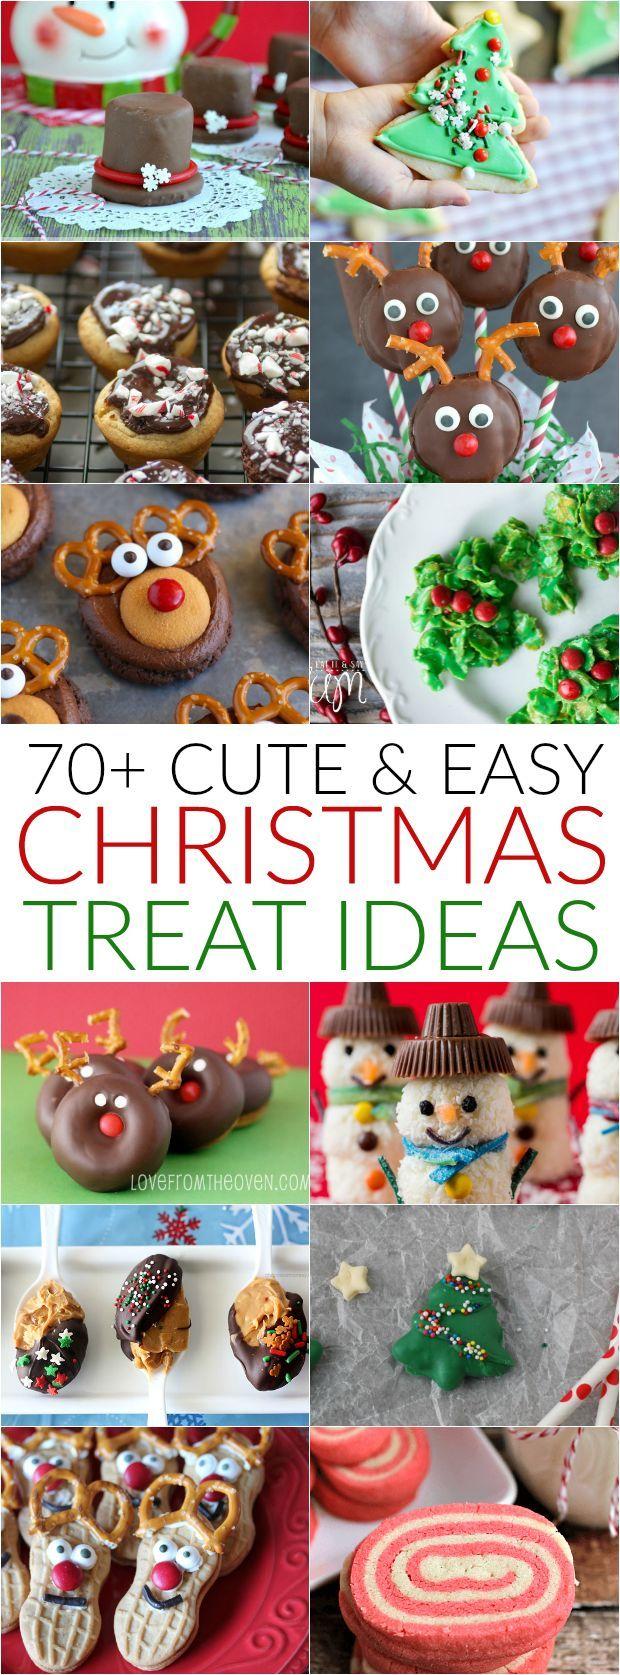 70+ Cute & Easy Christmas Treats   https://lomejordelaweb.es/